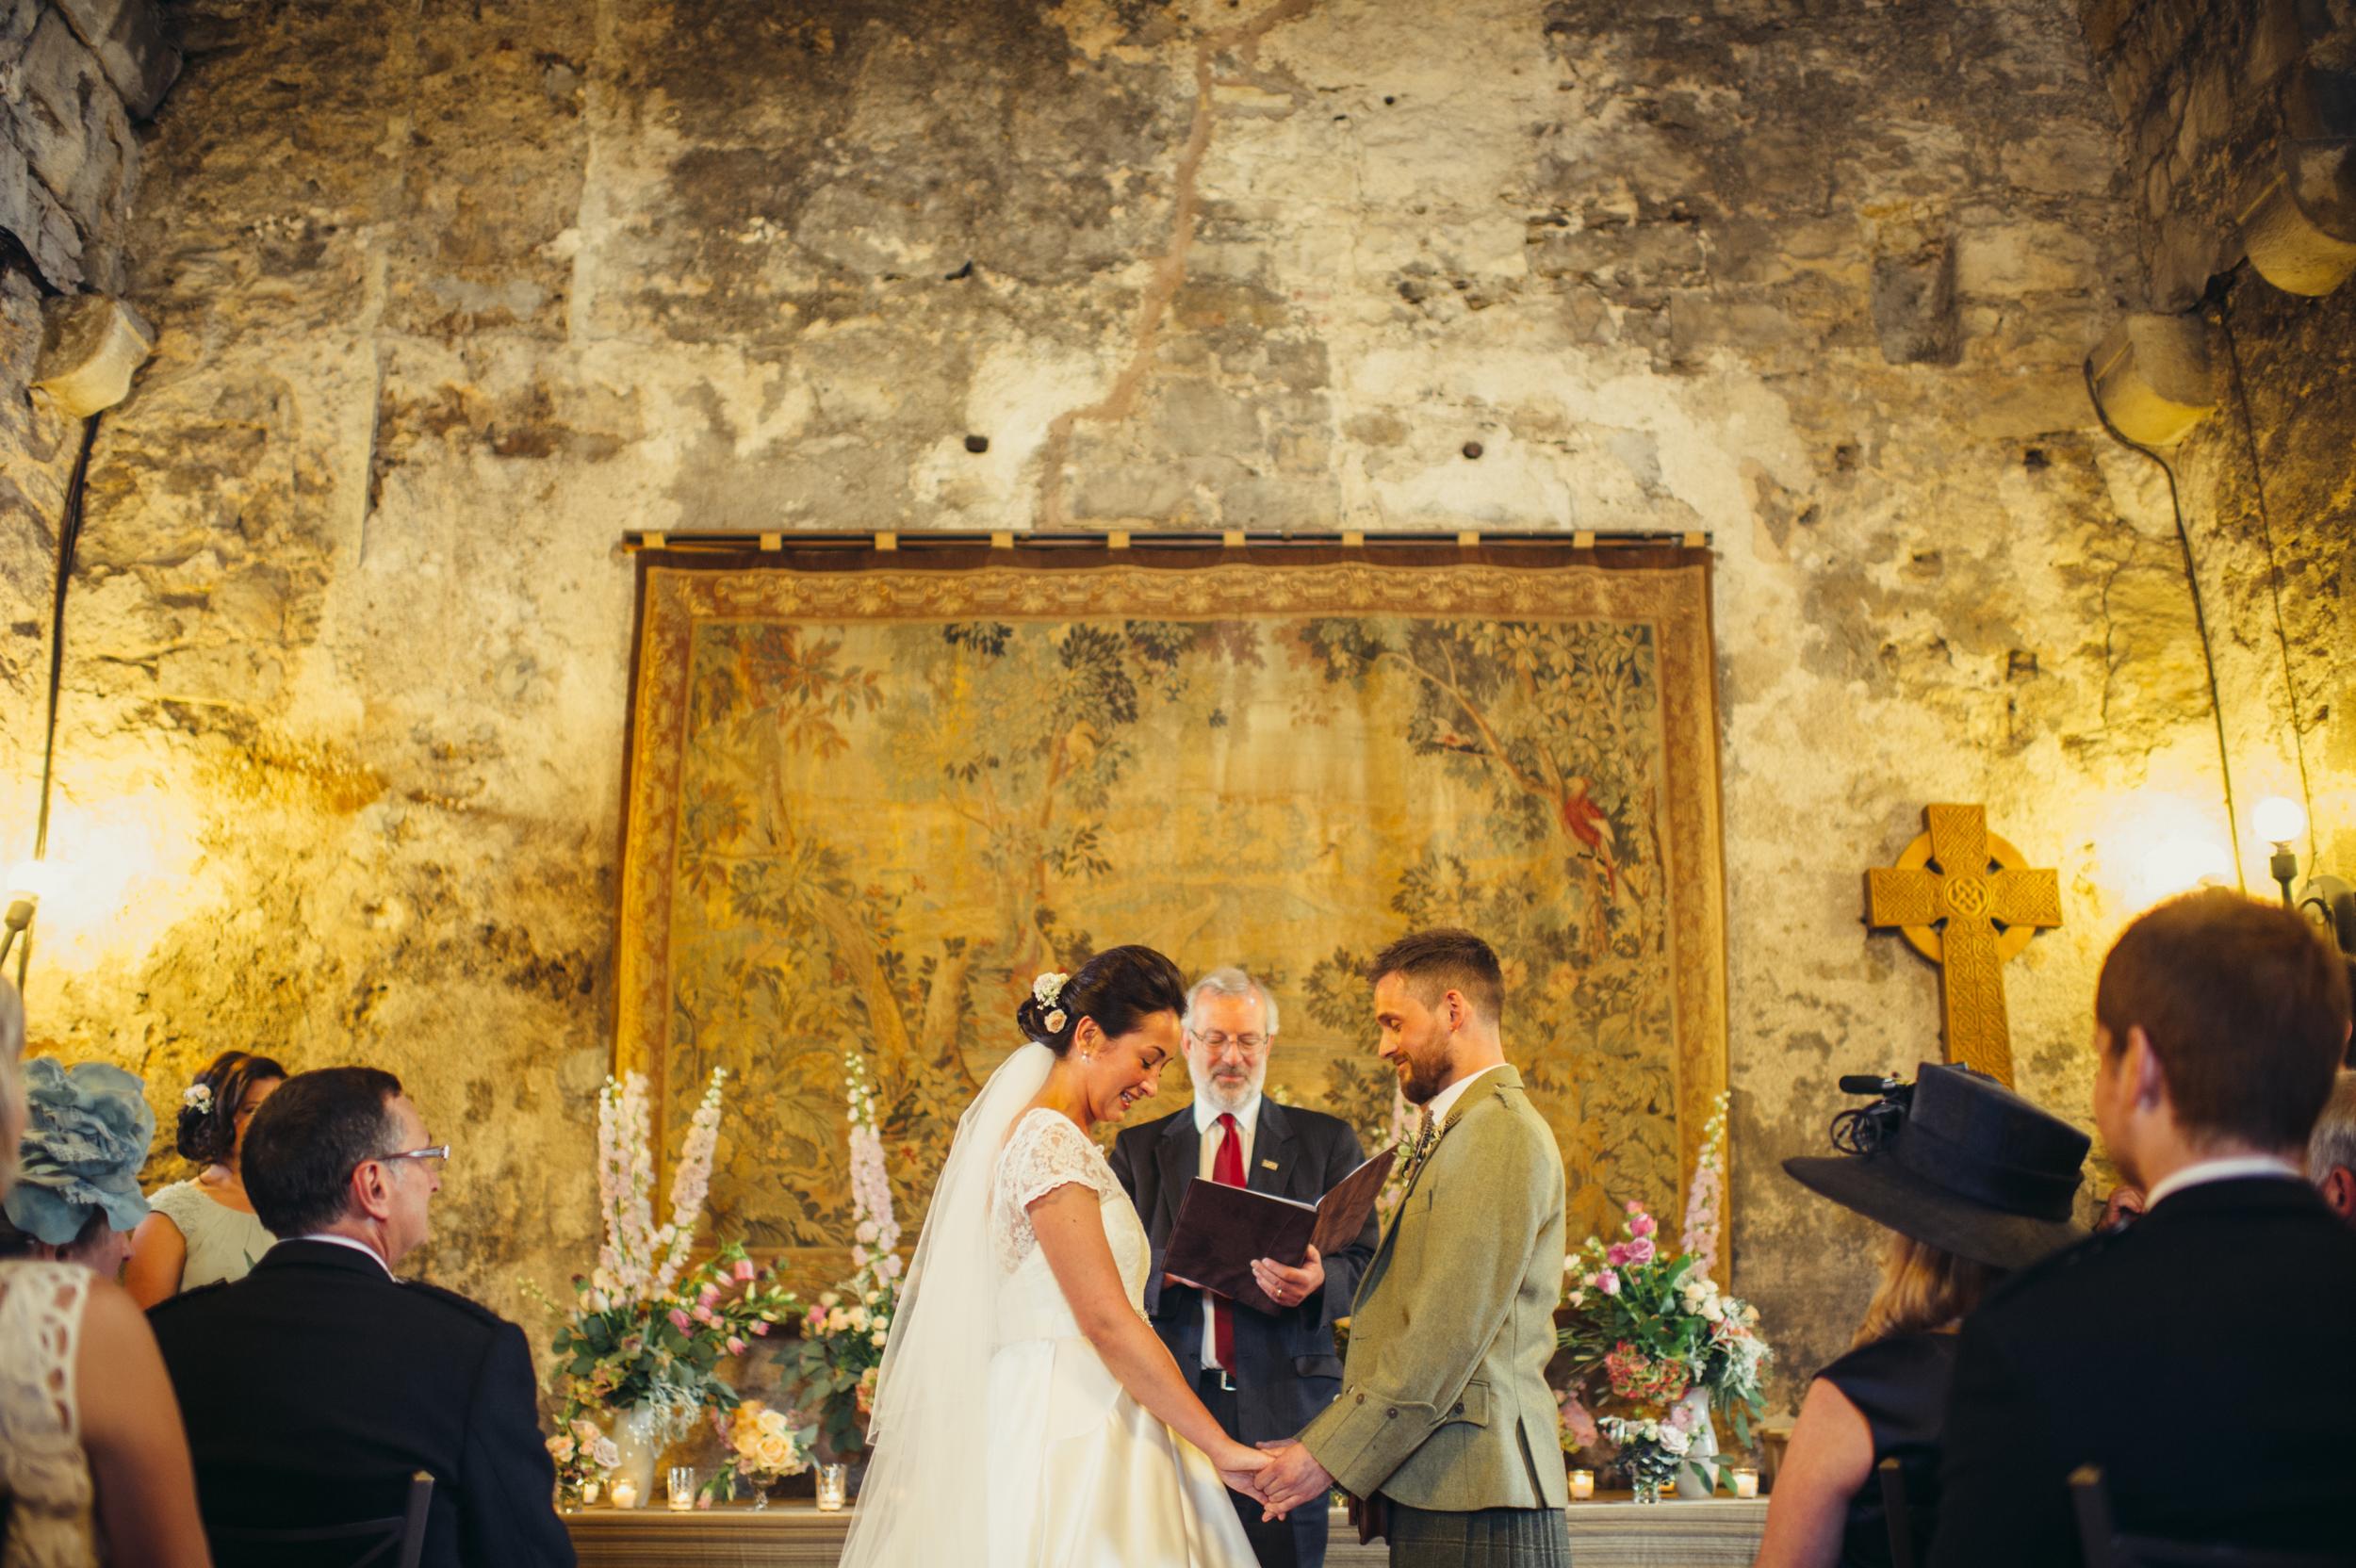 0101-lisa-devine-alternative-creative-wedding-photography-glasgow-edinburgh.JPG